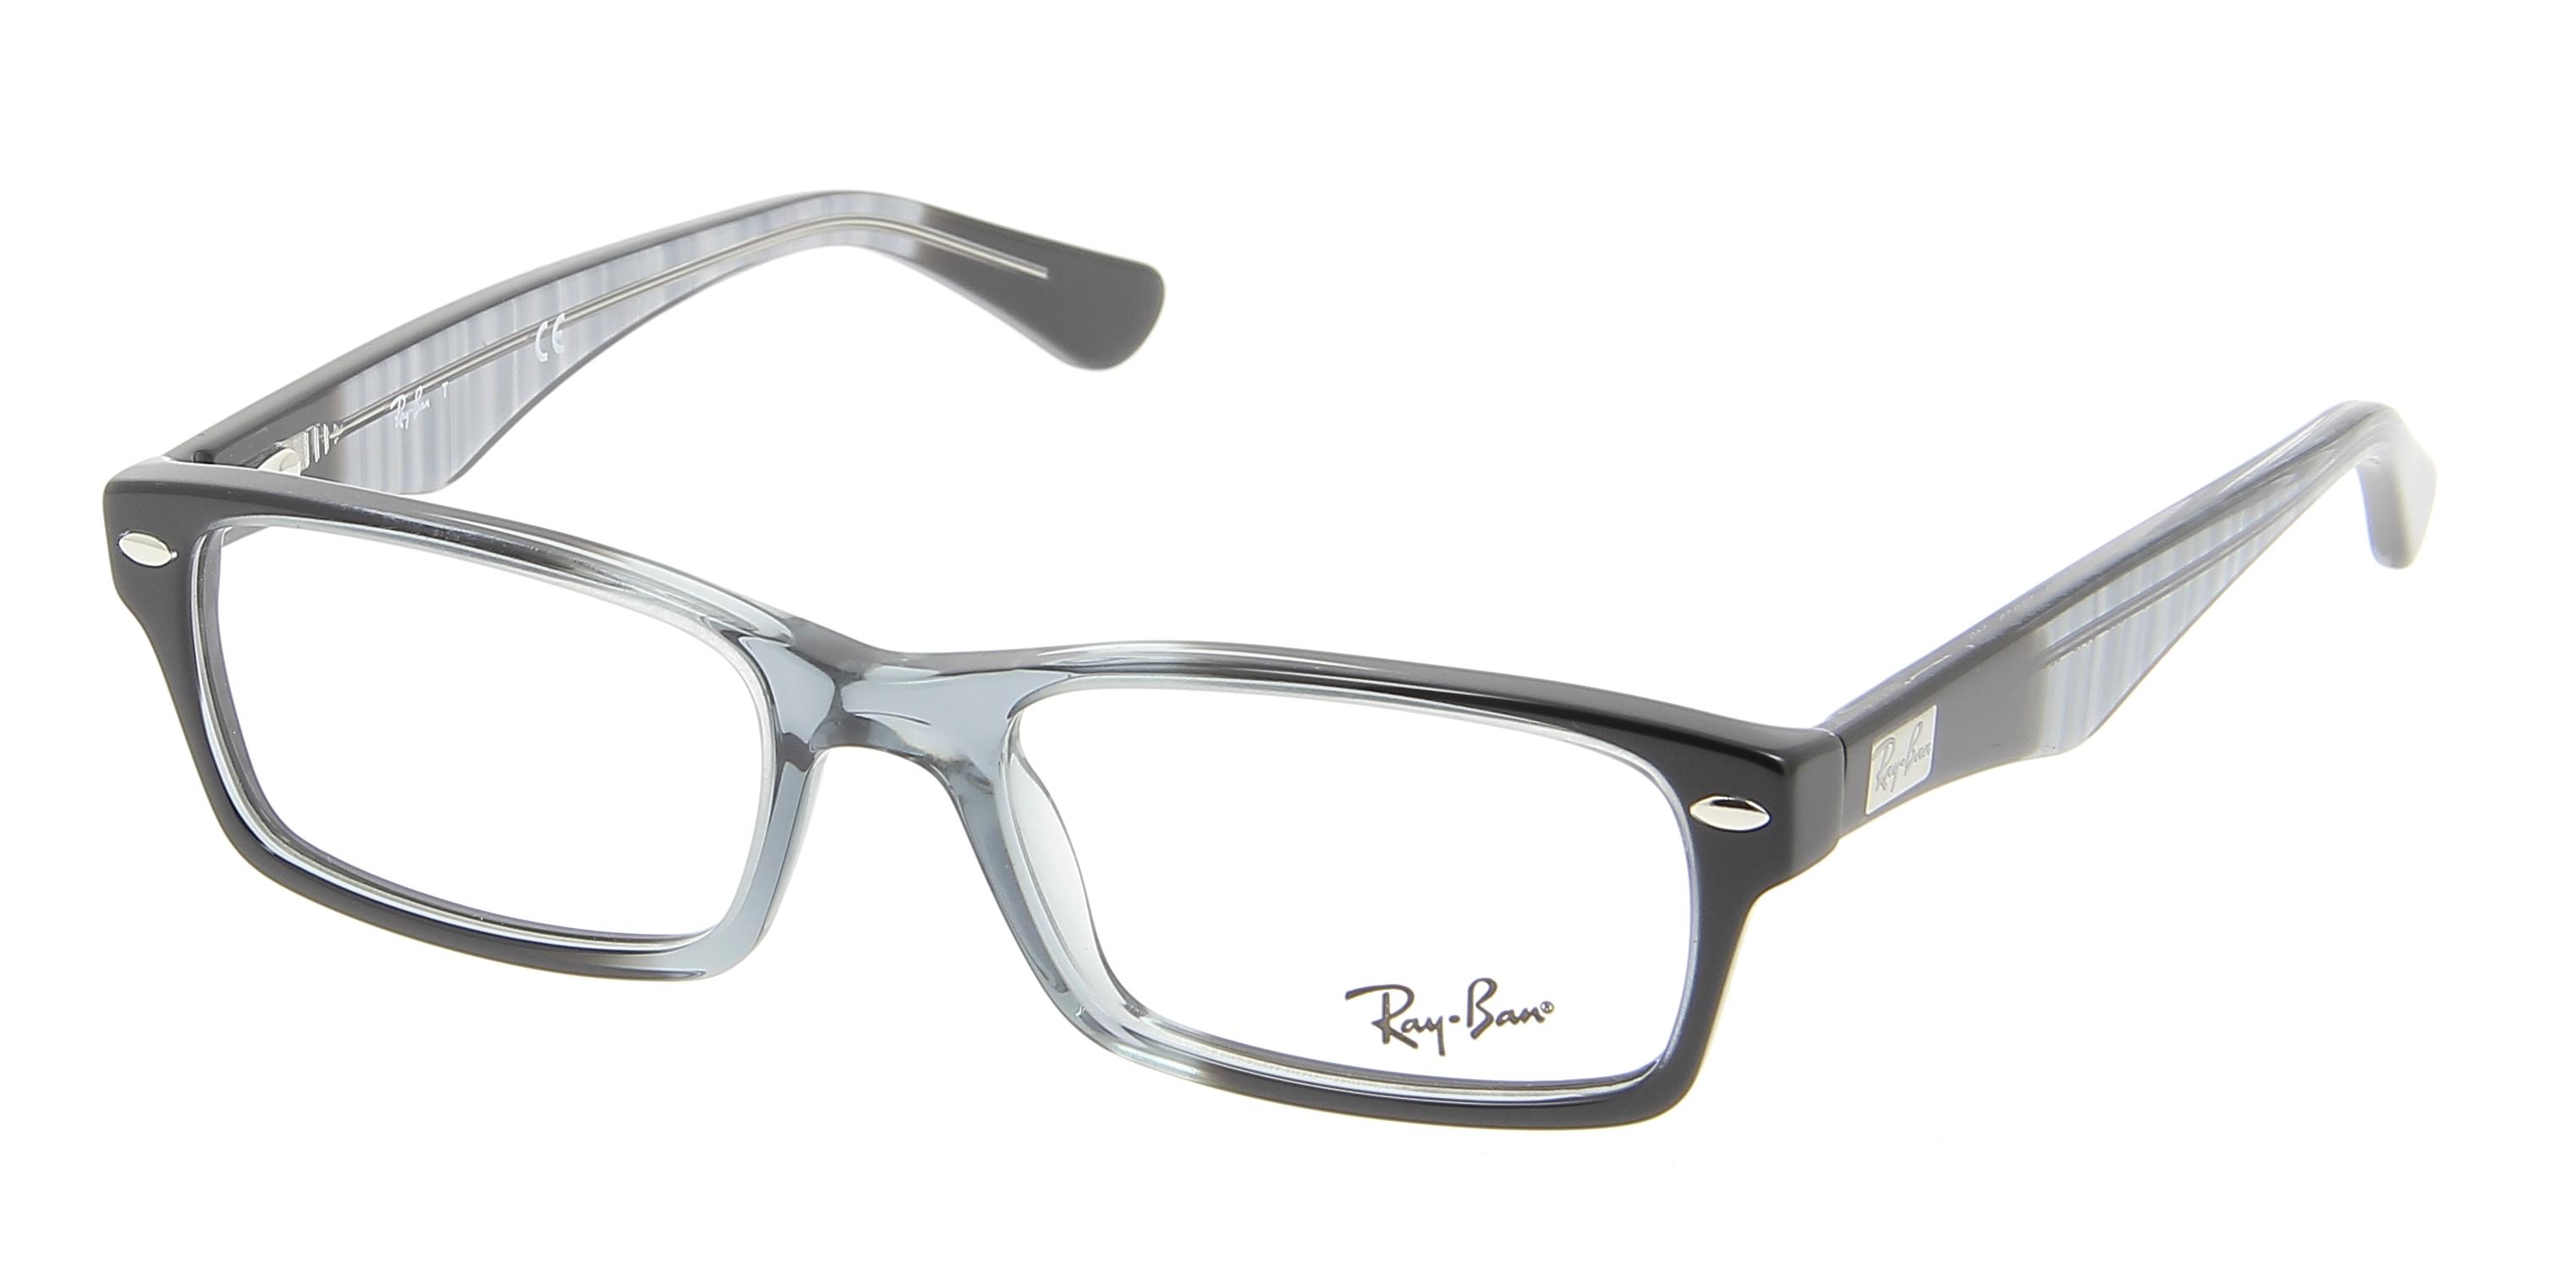 lunettes de vue homme tendance 2014. Black Bedroom Furniture Sets. Home Design Ideas